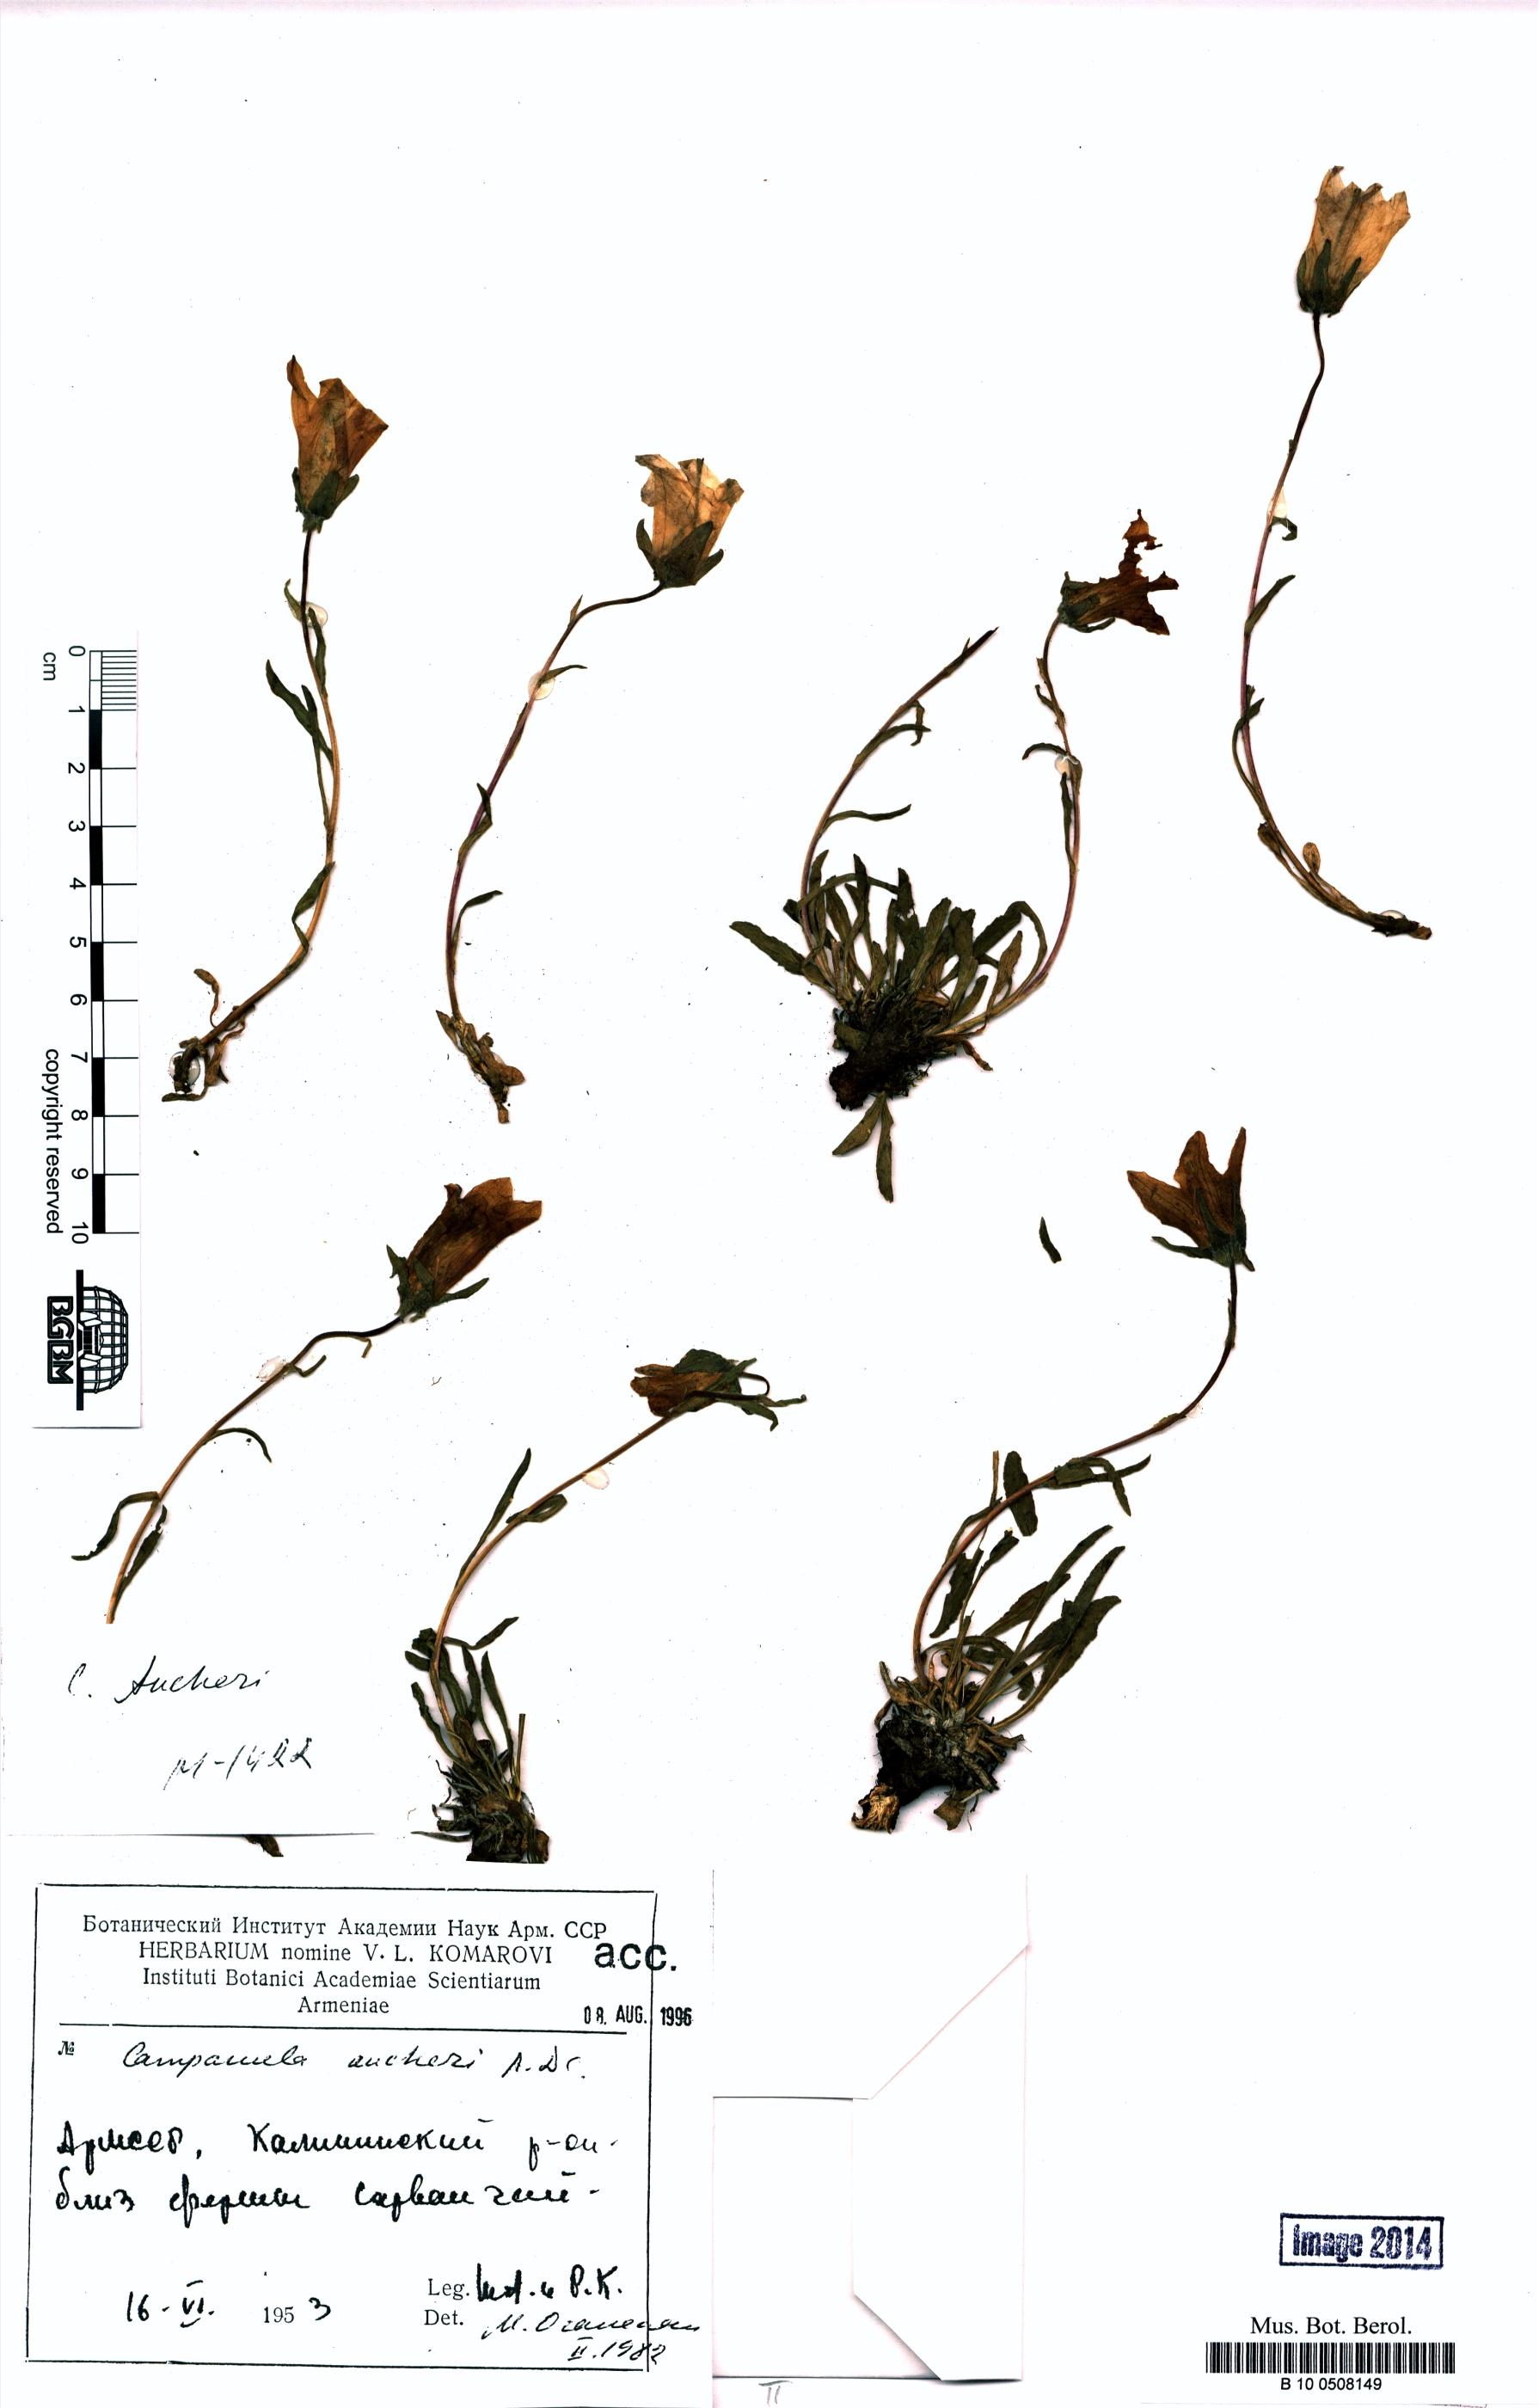 http://ww2.bgbm.org/herbarium/images/B/10/05/08/14/B_10_0508149.jpg